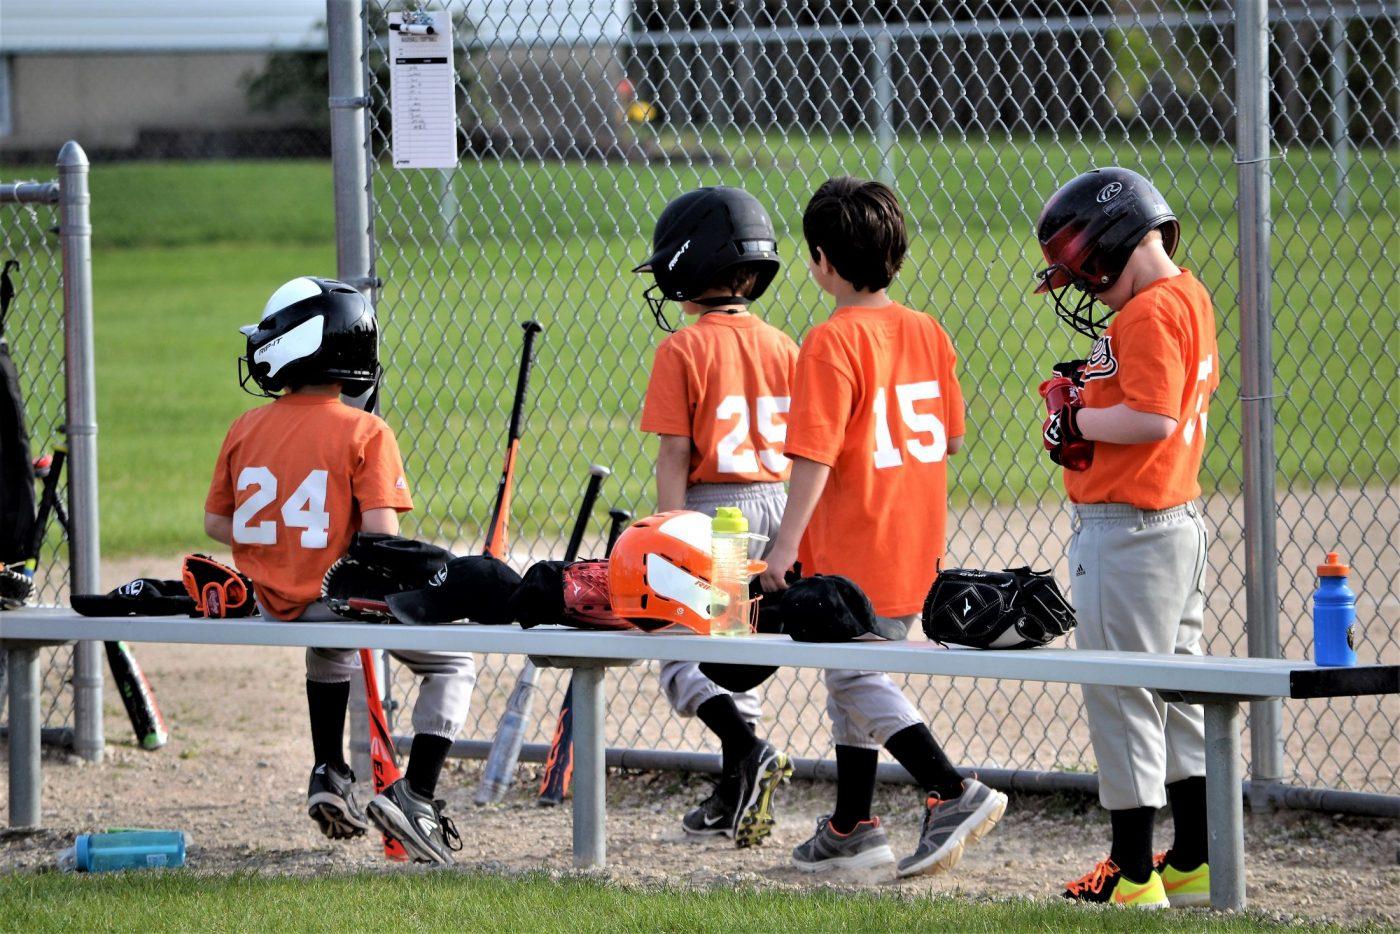 little league team getting ready to bat